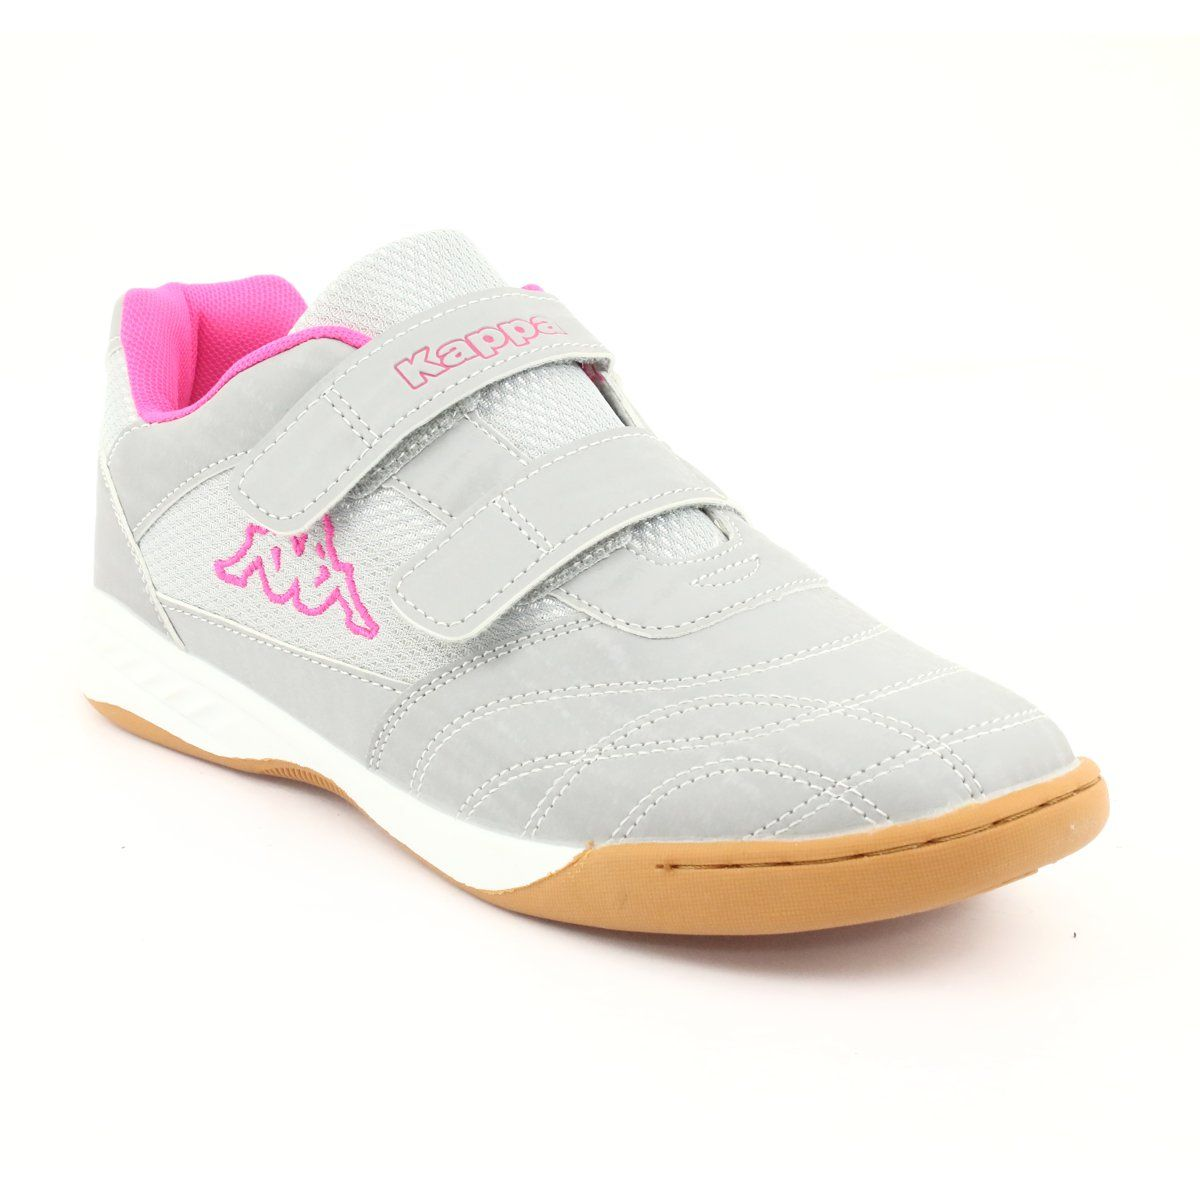 Buty Kappa Kickoff T Jr 260509t 1522 Rozowe Szare Baby Shoes Shoes Kappa